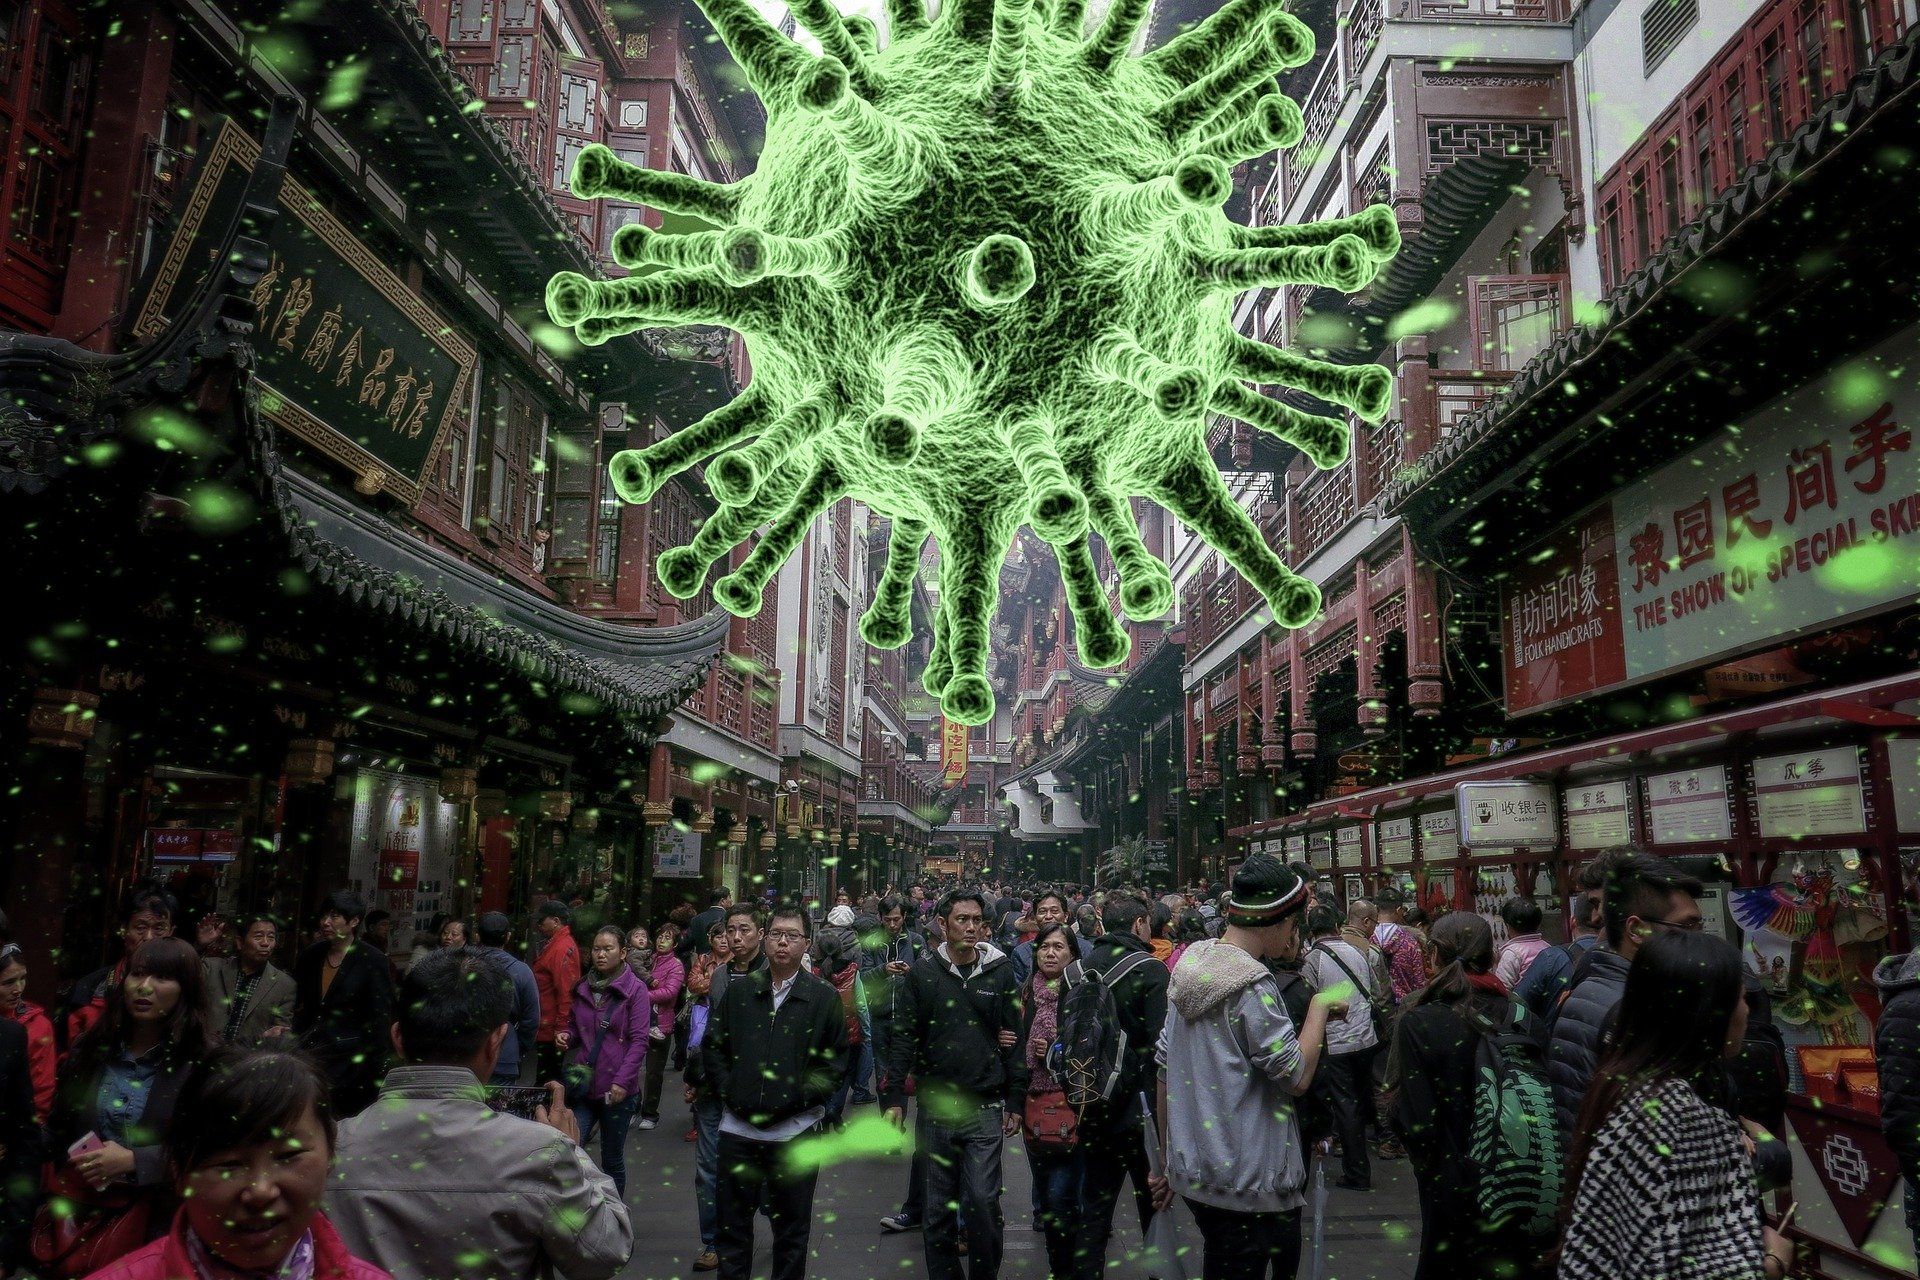 Die alternative Welt anti-kapitalistischer Coronavirus-Experten